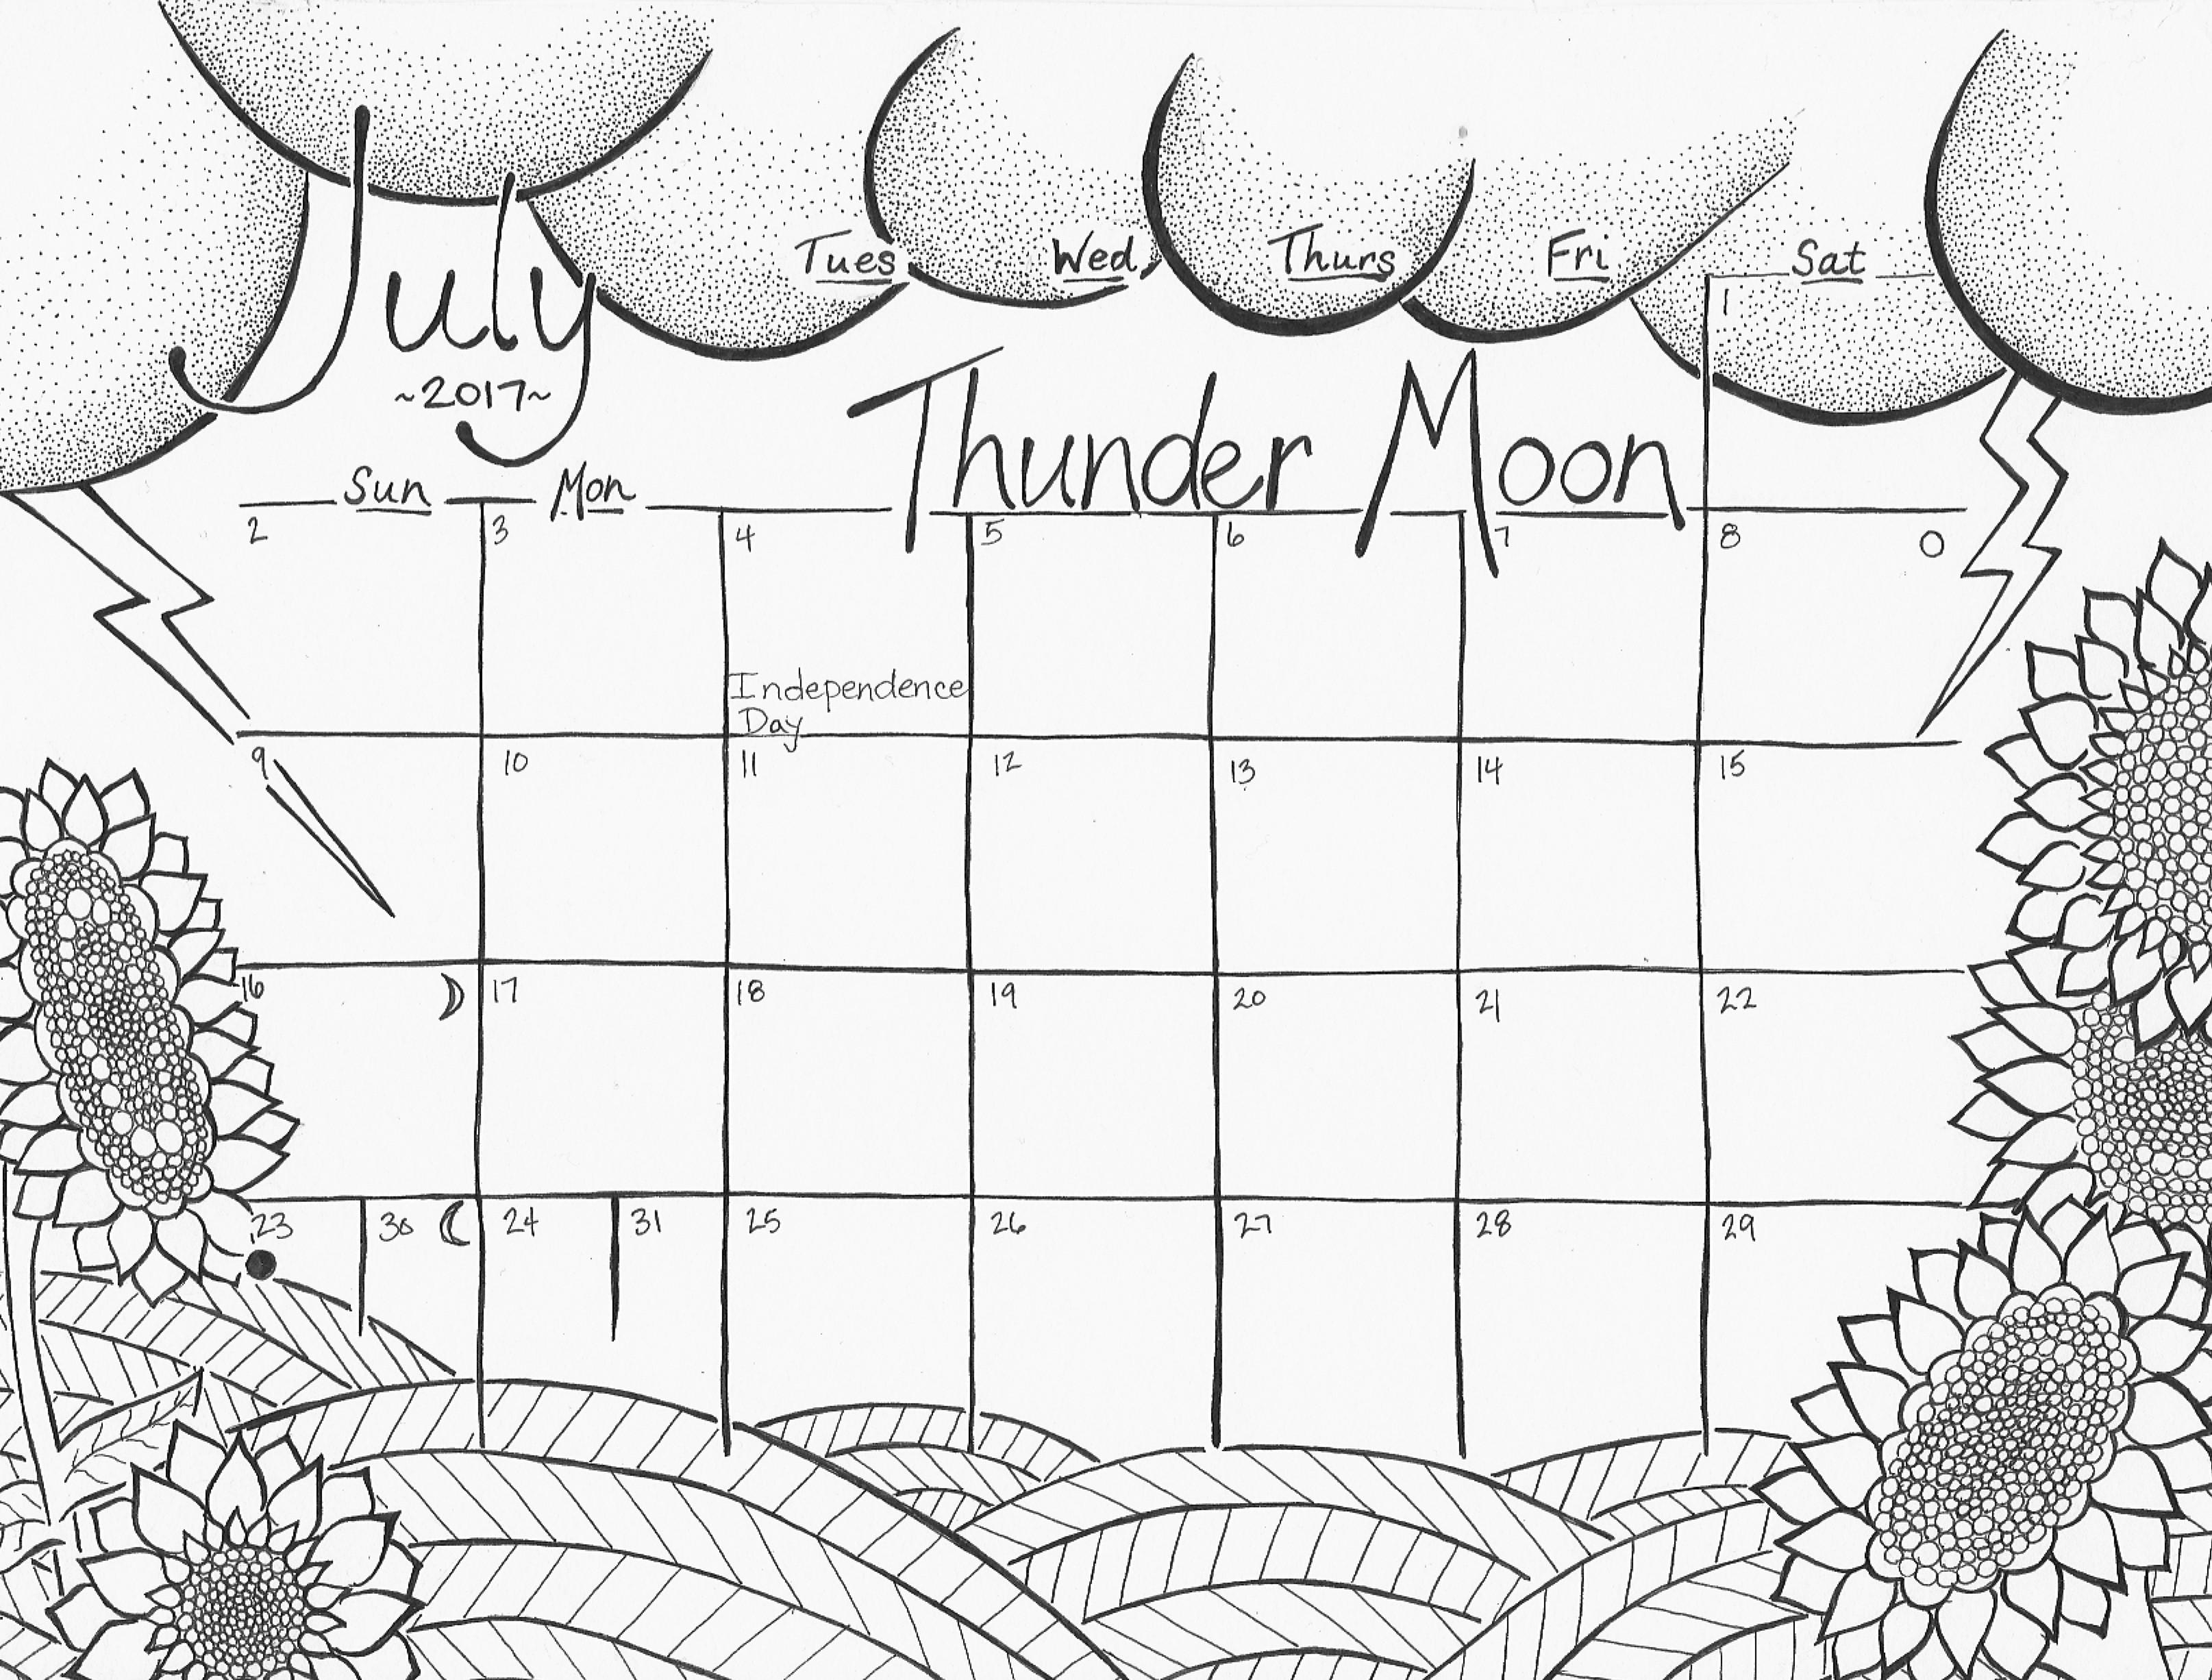 March Calendar Doodles Más Arriba-a-fecha Coloring Pages Calendar Eskayalitim Of March Calendar Doodles Más Caliente Free Printable 2017 Calendar Printables Pinterest